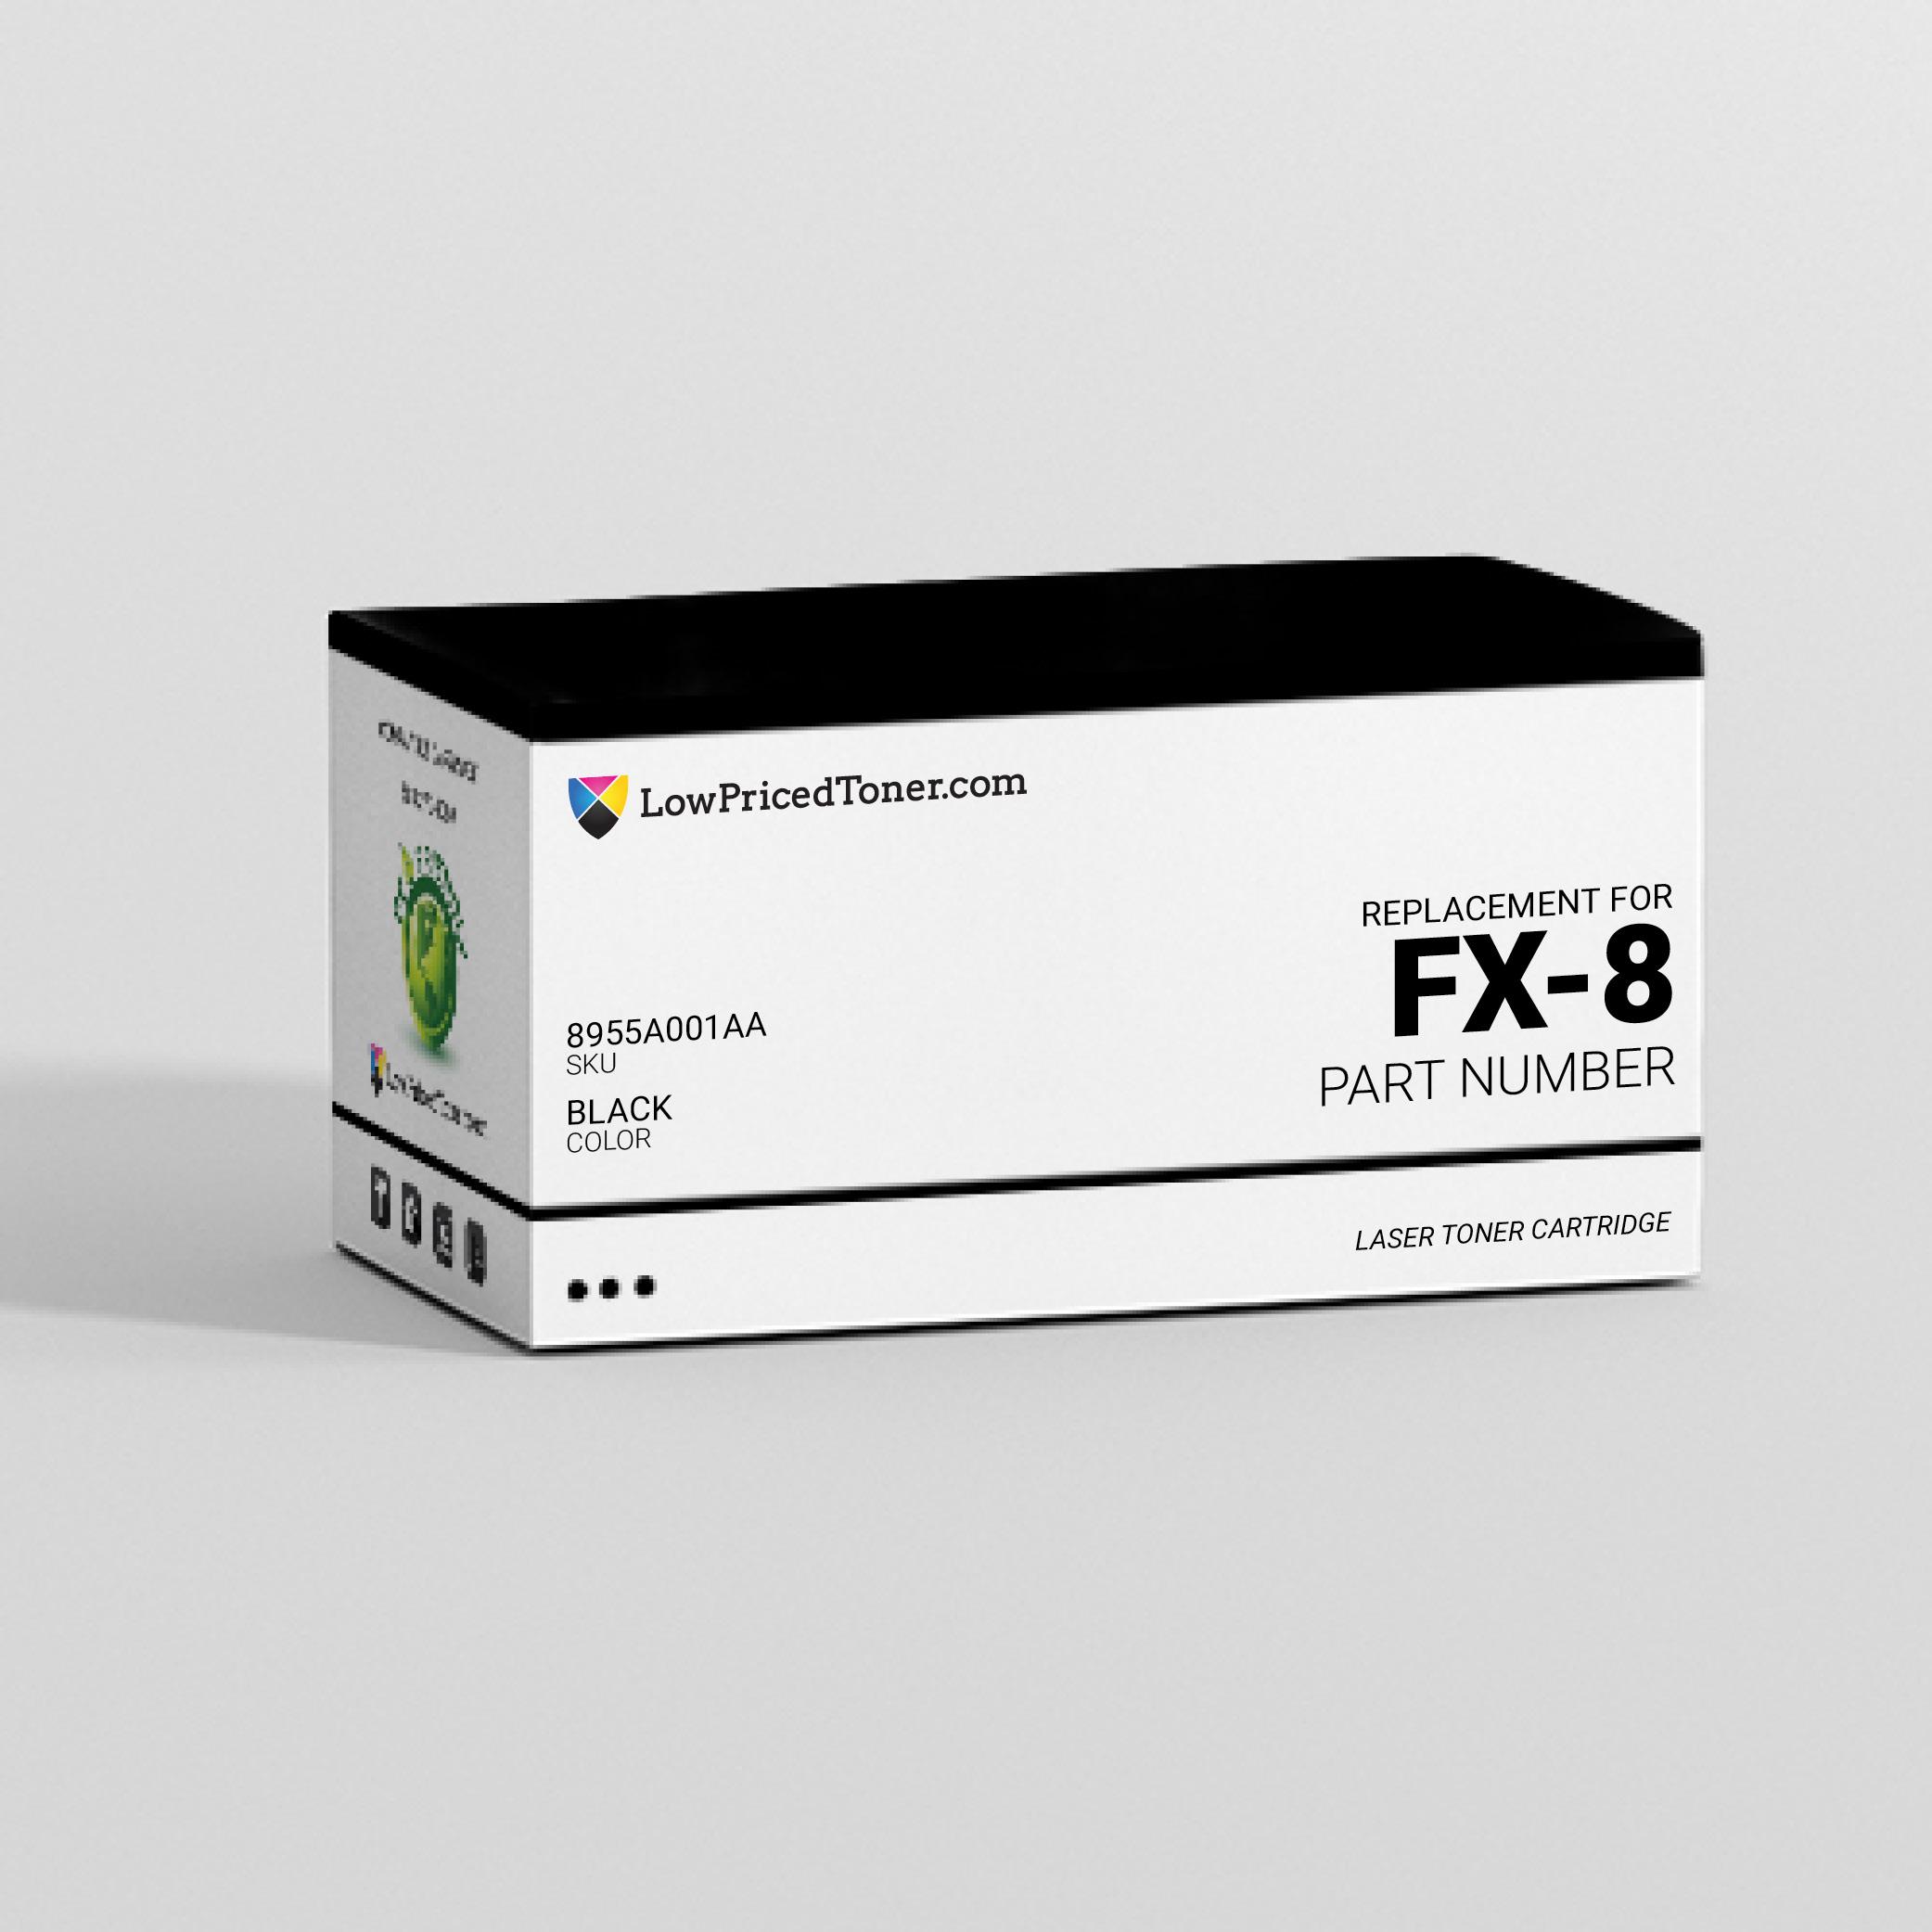 Canon 8955A001AA FX-8 Remanufactured Black Laser Toner Cartridge